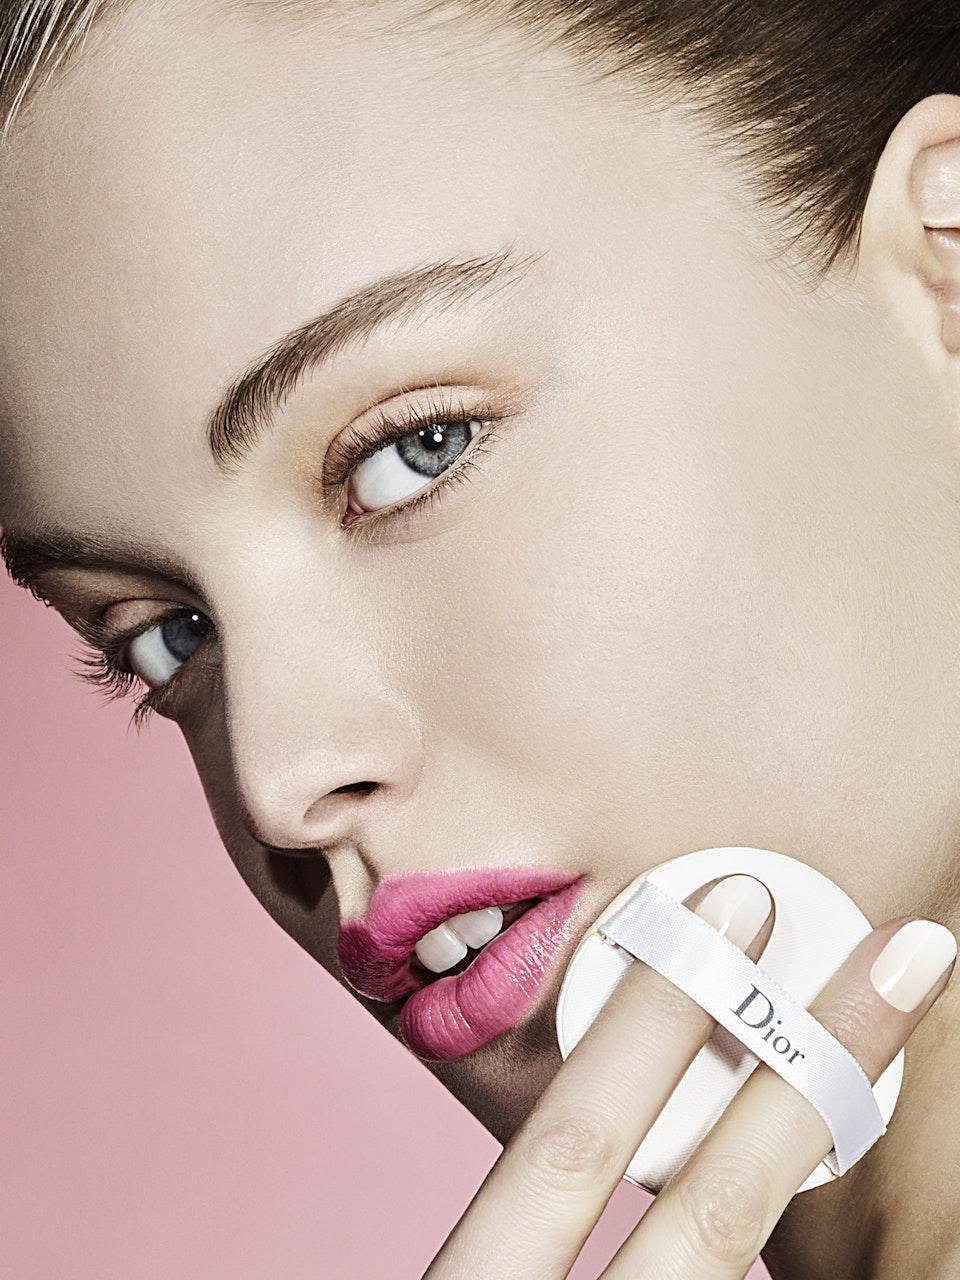 Charlie for Dior